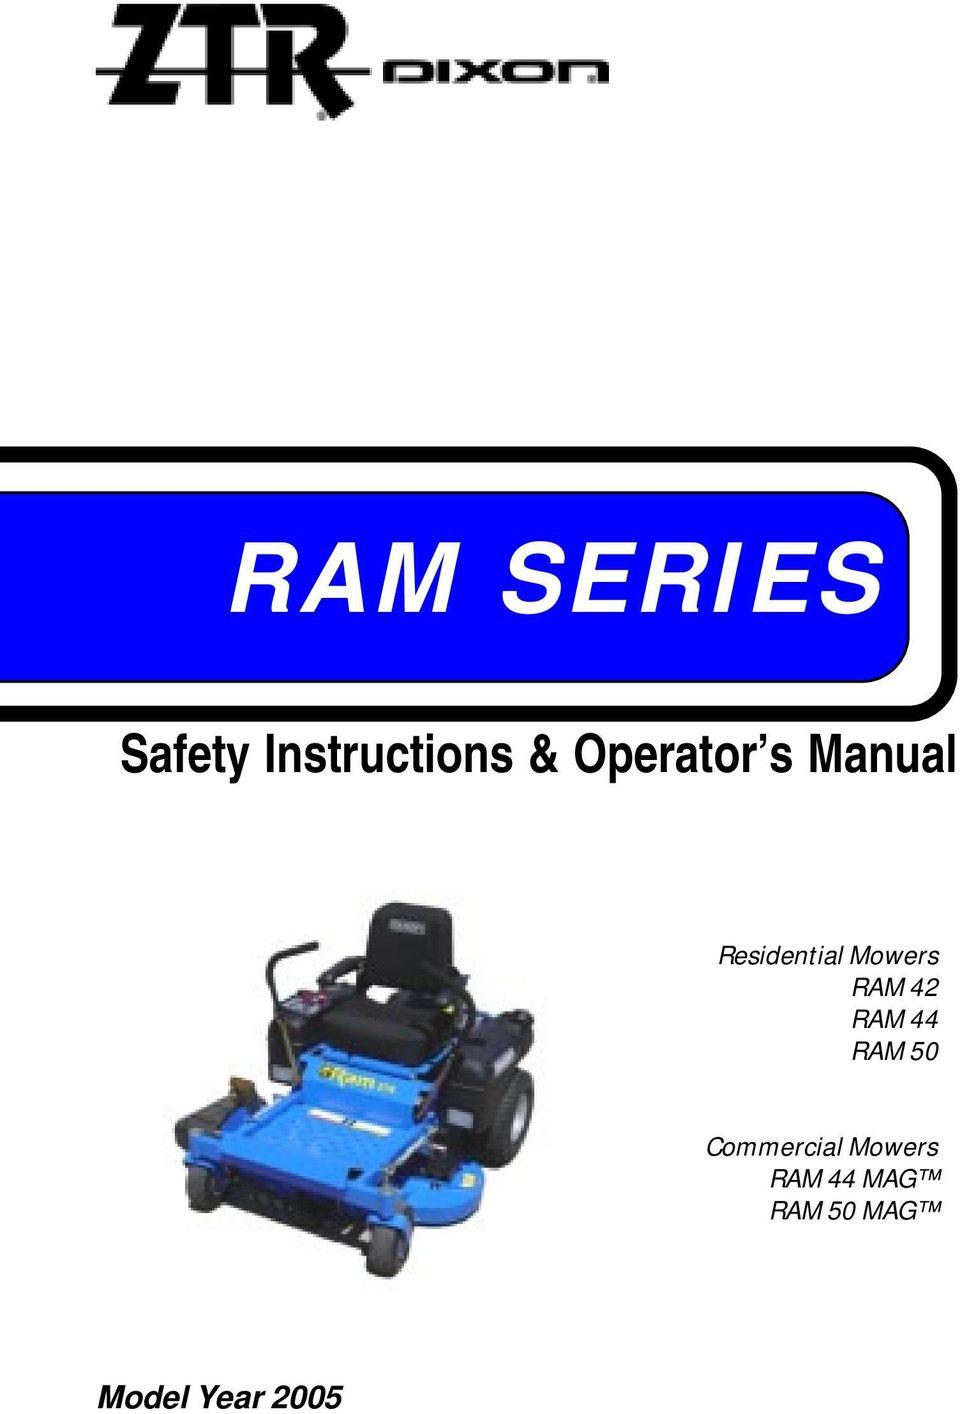 hight resolution of ram 42 ram 44 ram 50 commercial